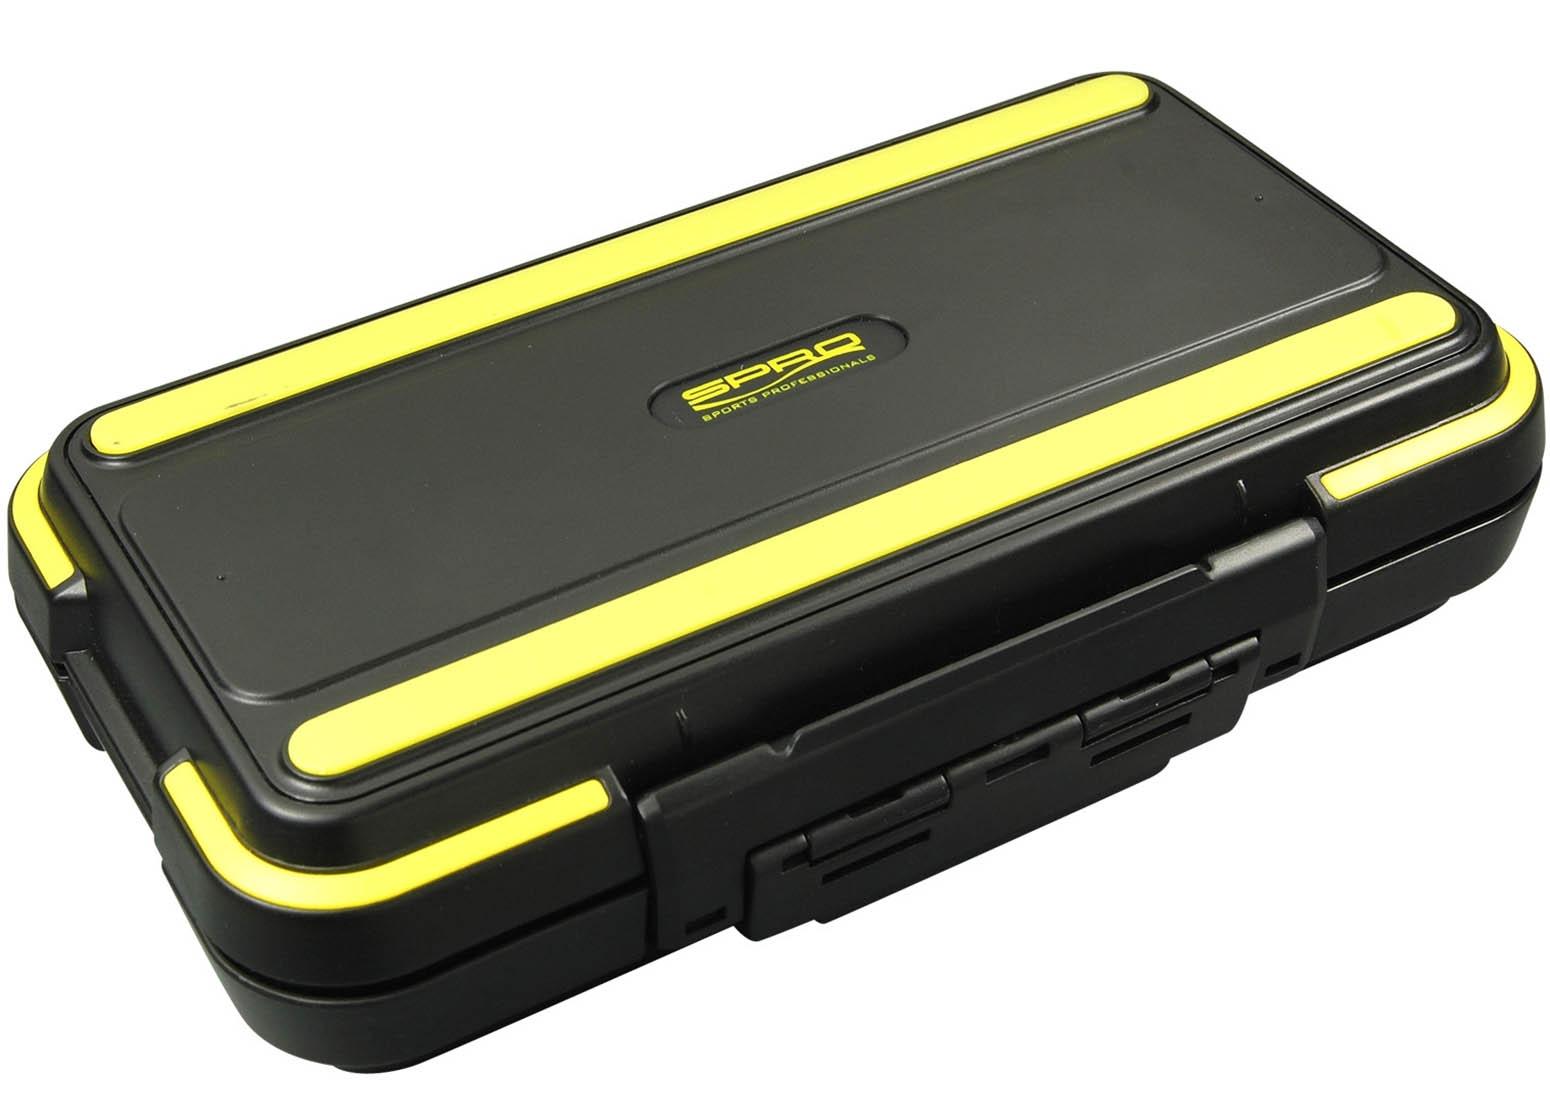 Коробка рыболовная SPRO PARTS STOCKER 197mmx115mmx50mm, Ящики и чехлы - арт. 183320343